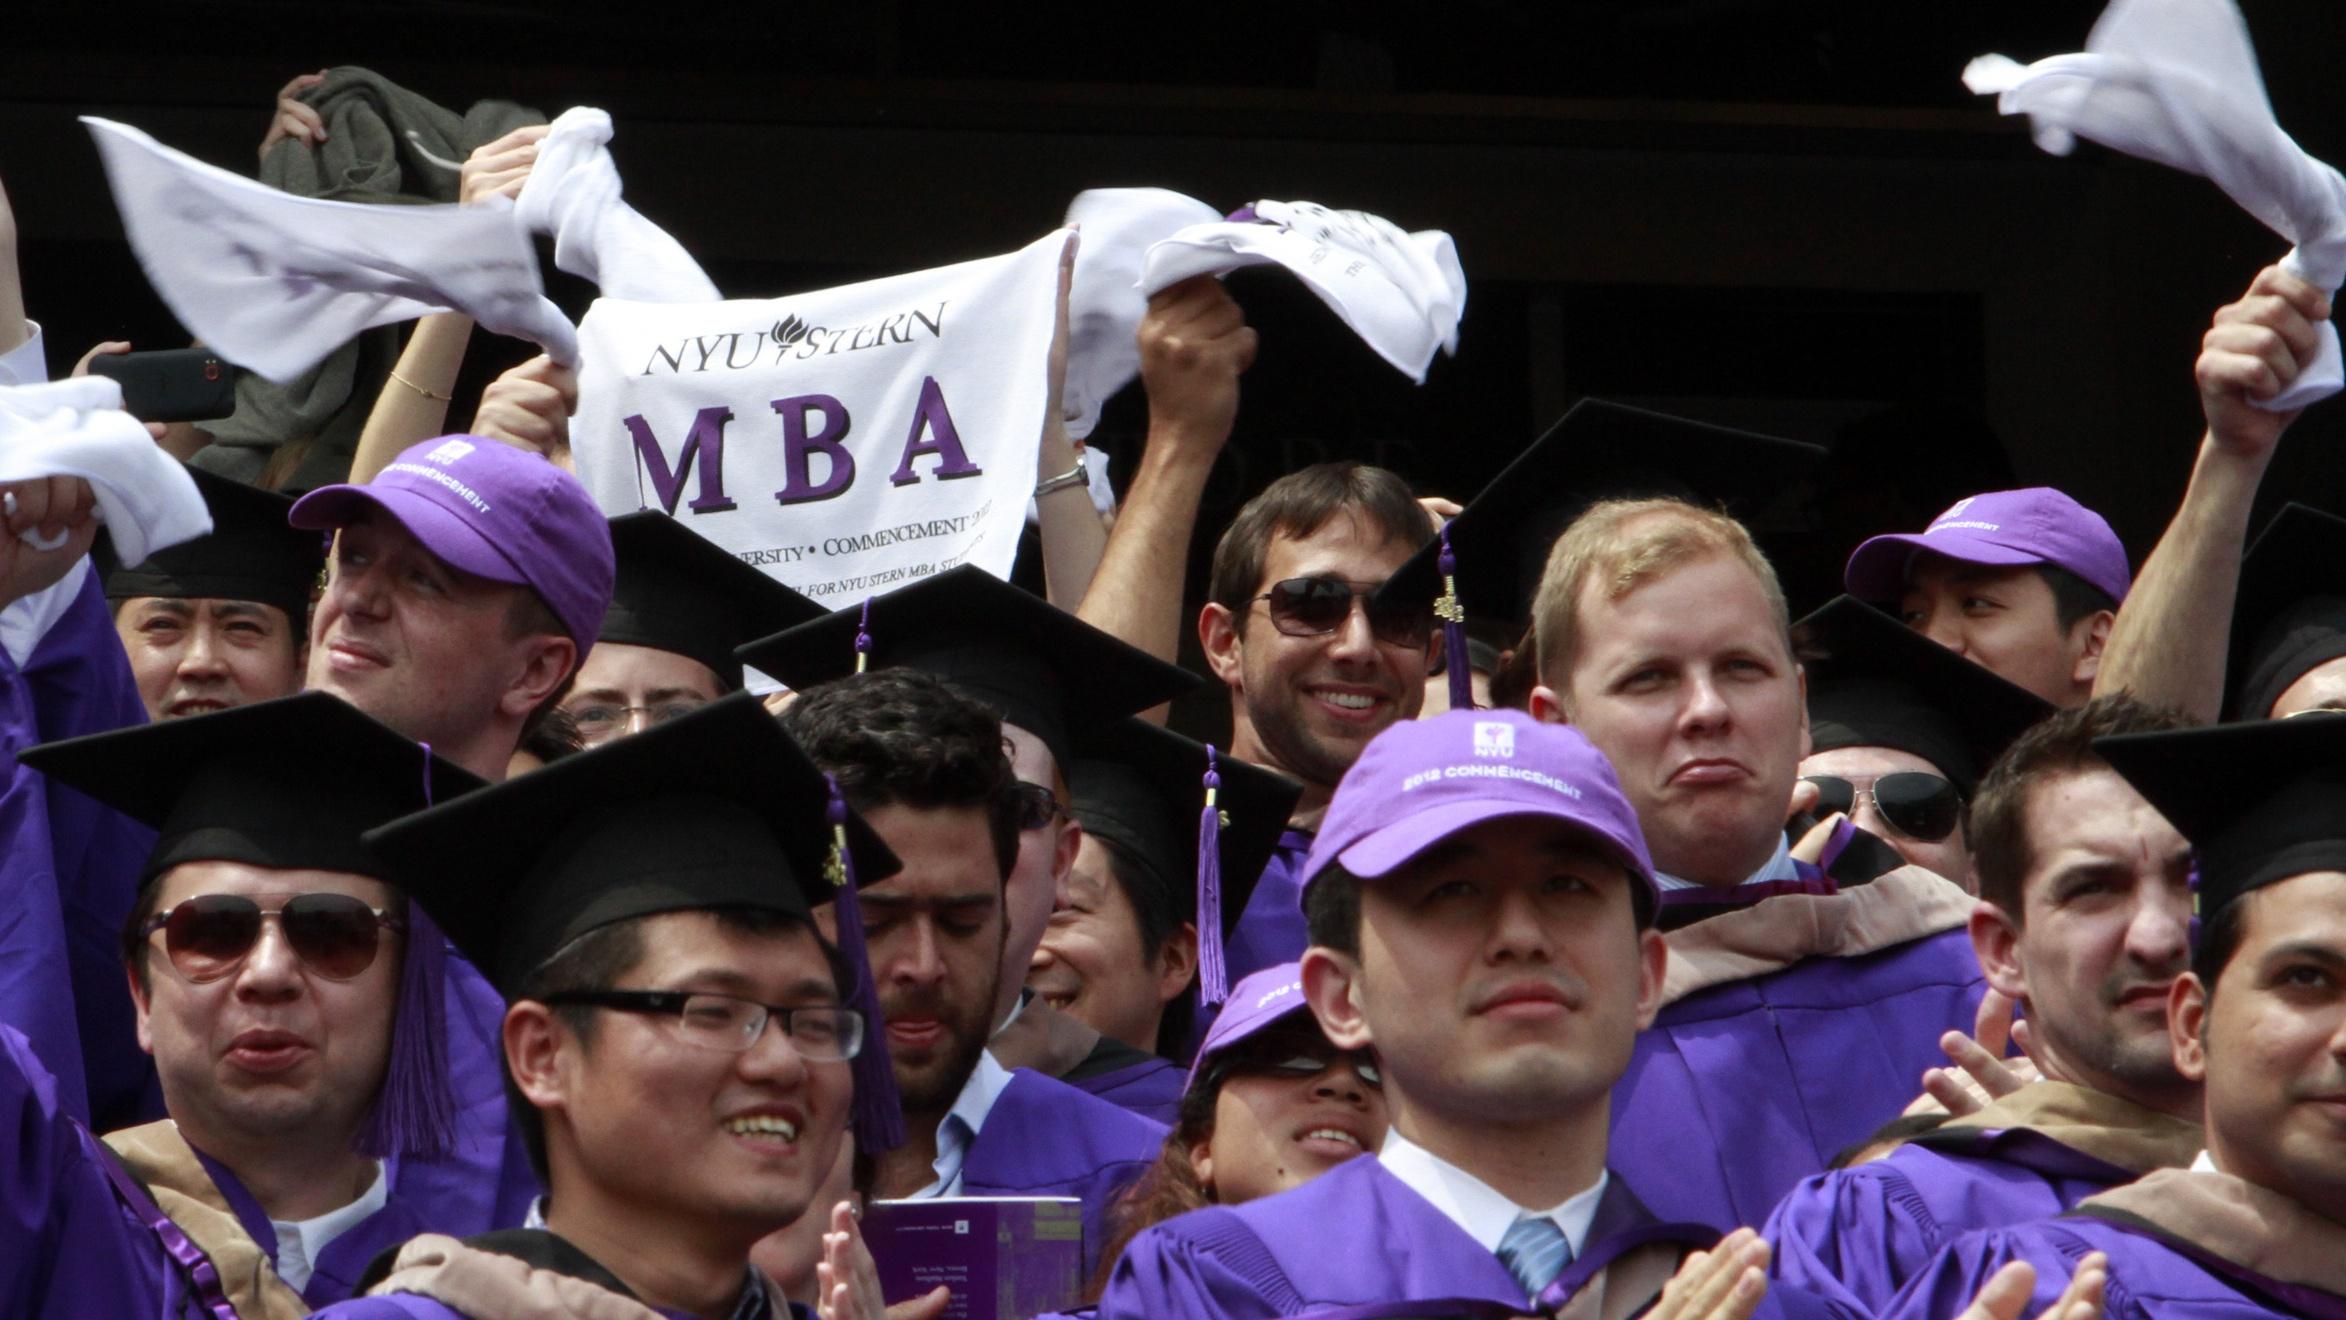 cheering MBA graduates